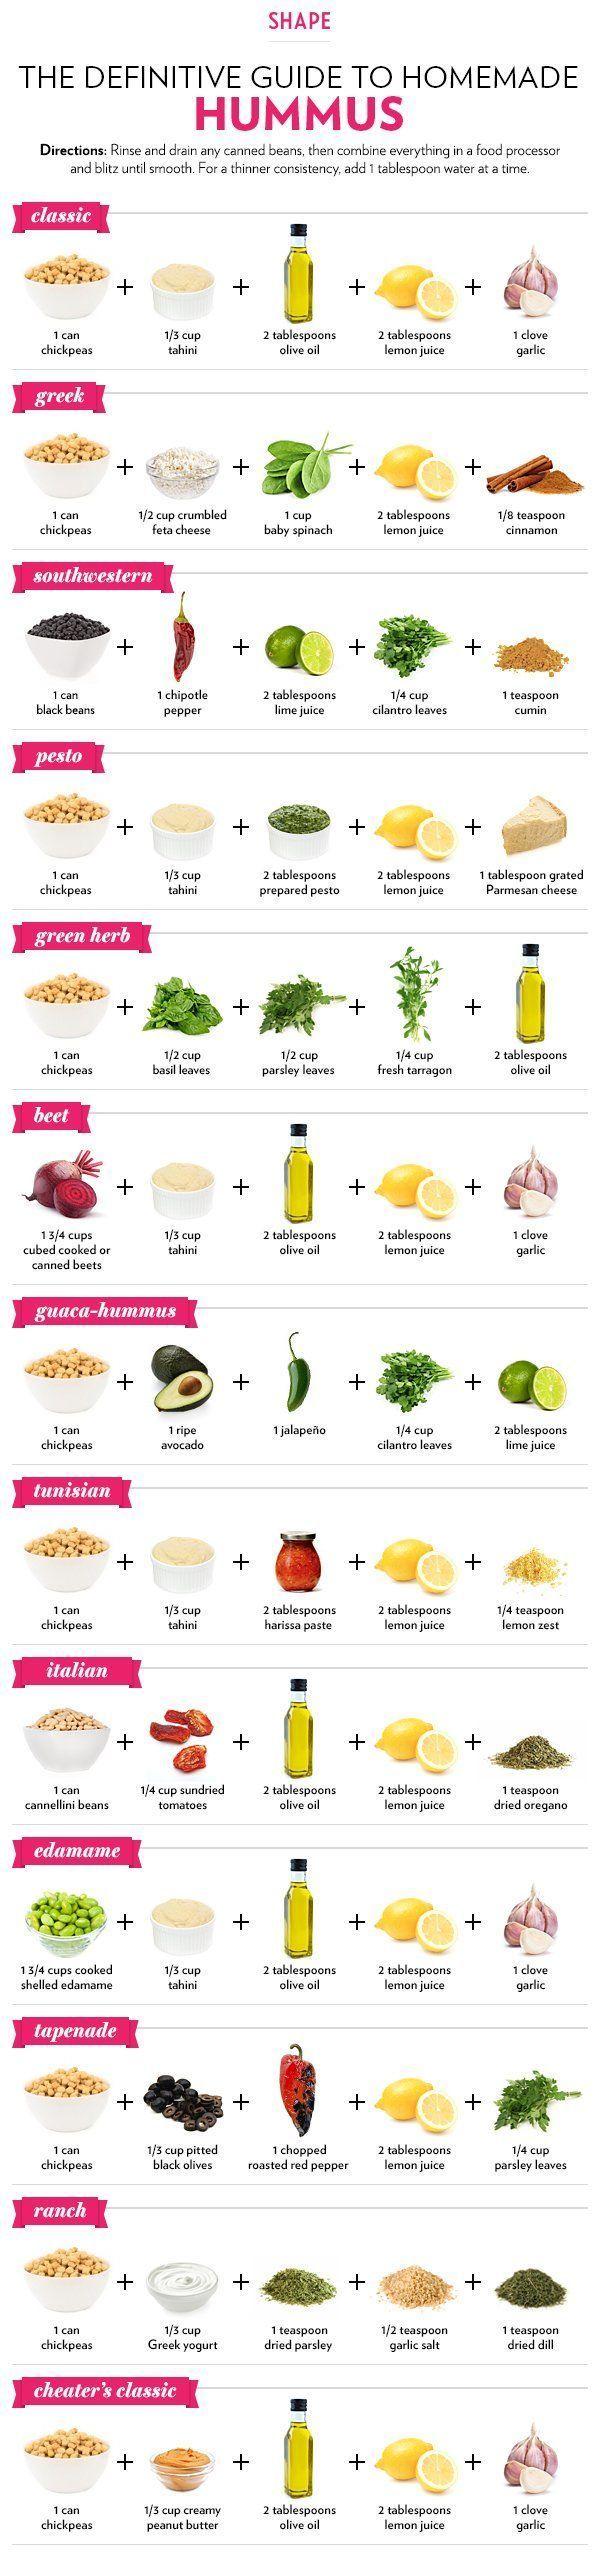 13 Ways to Make Homemade Hummus | Skinny Mom | Where Moms Get the Skinny on Healthy Living